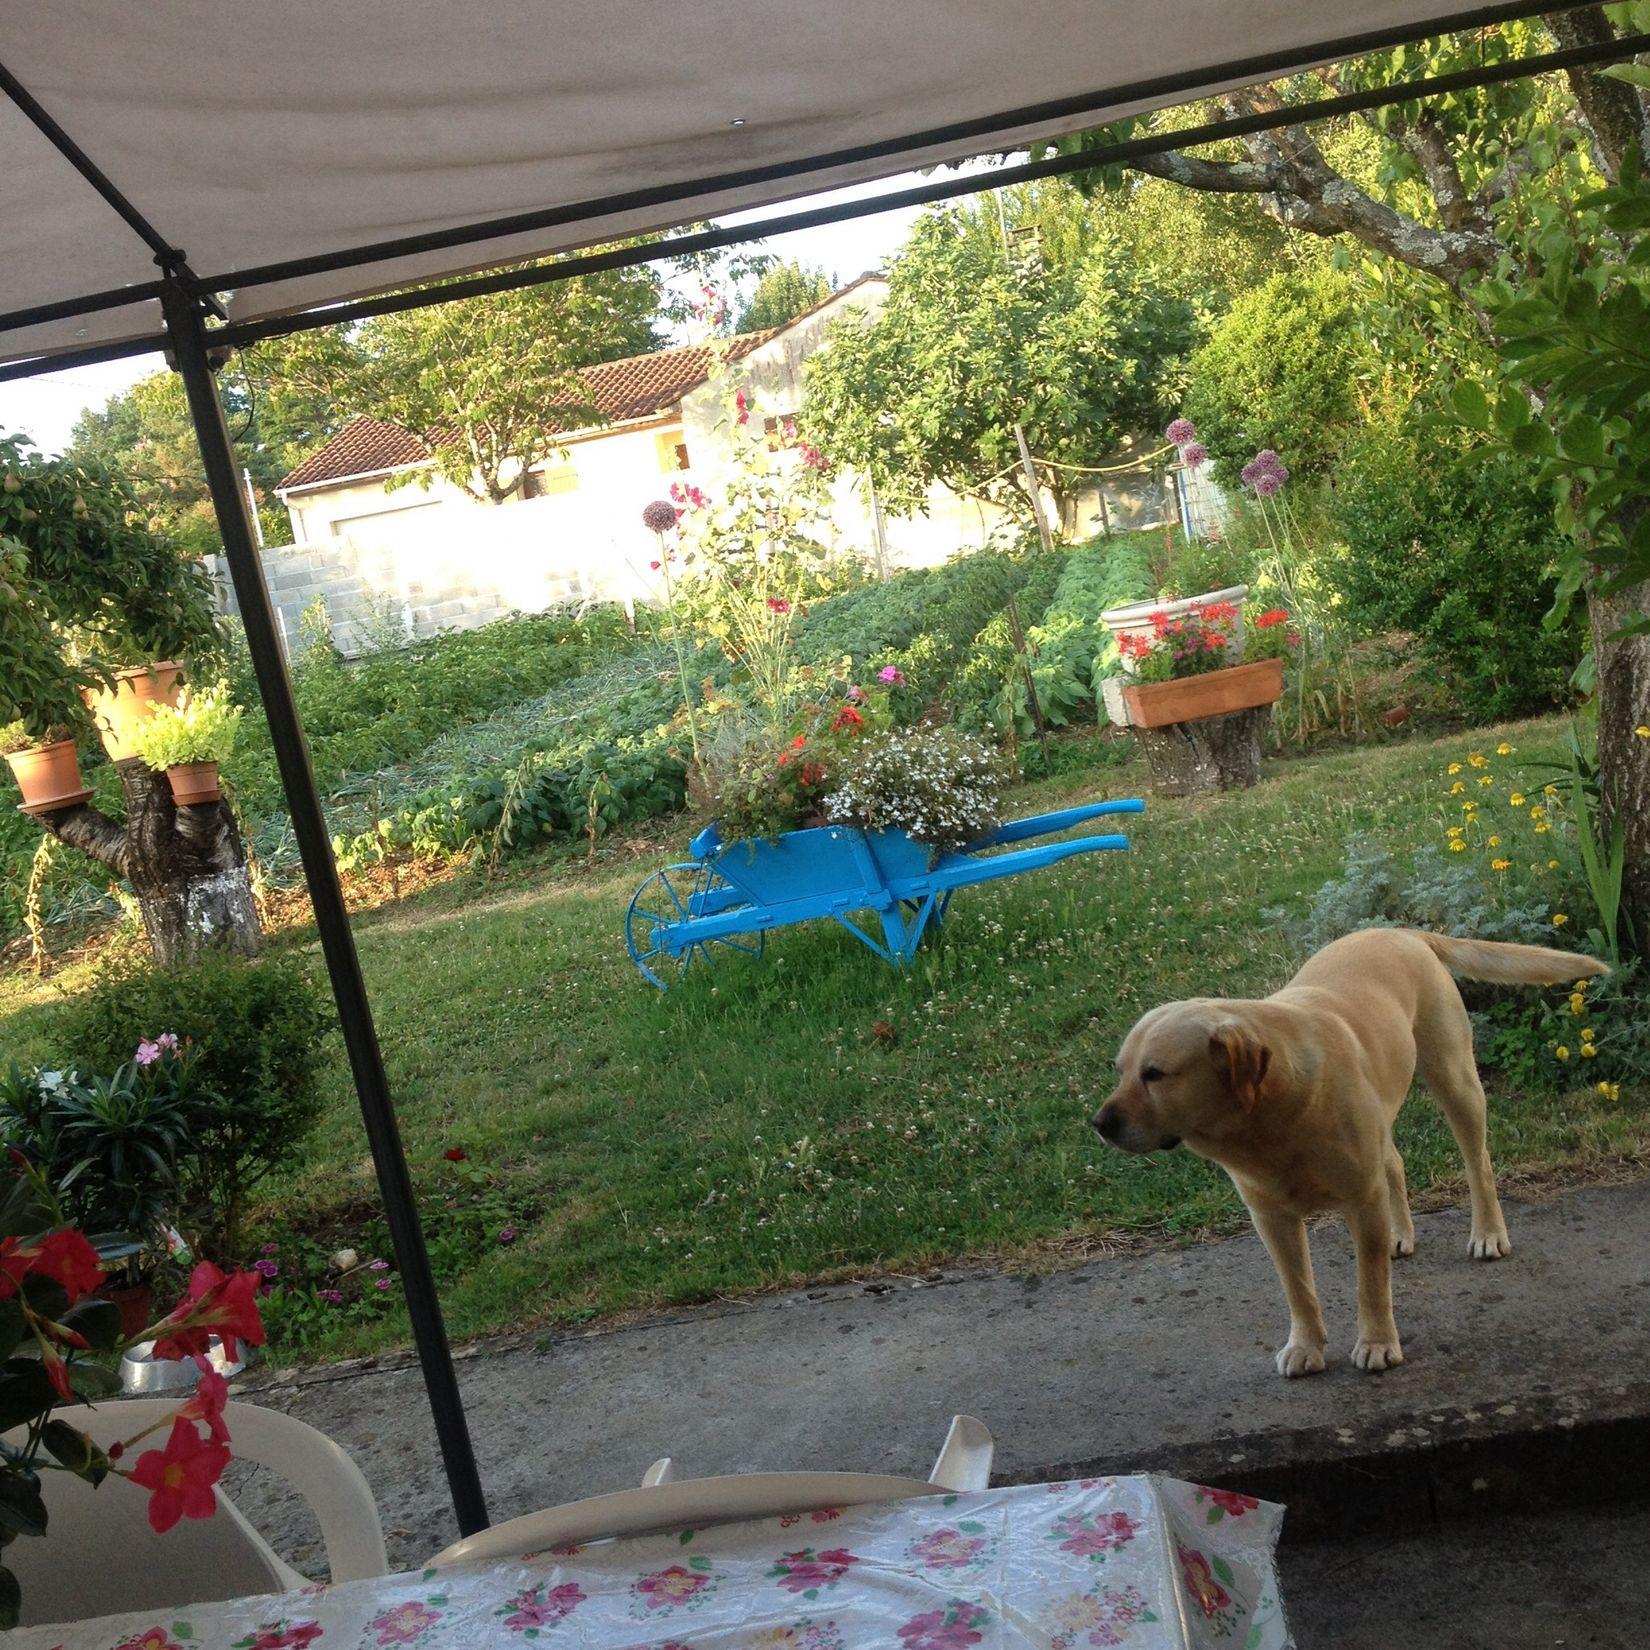 Taking Photos Relaxing Dog Garden ???????????